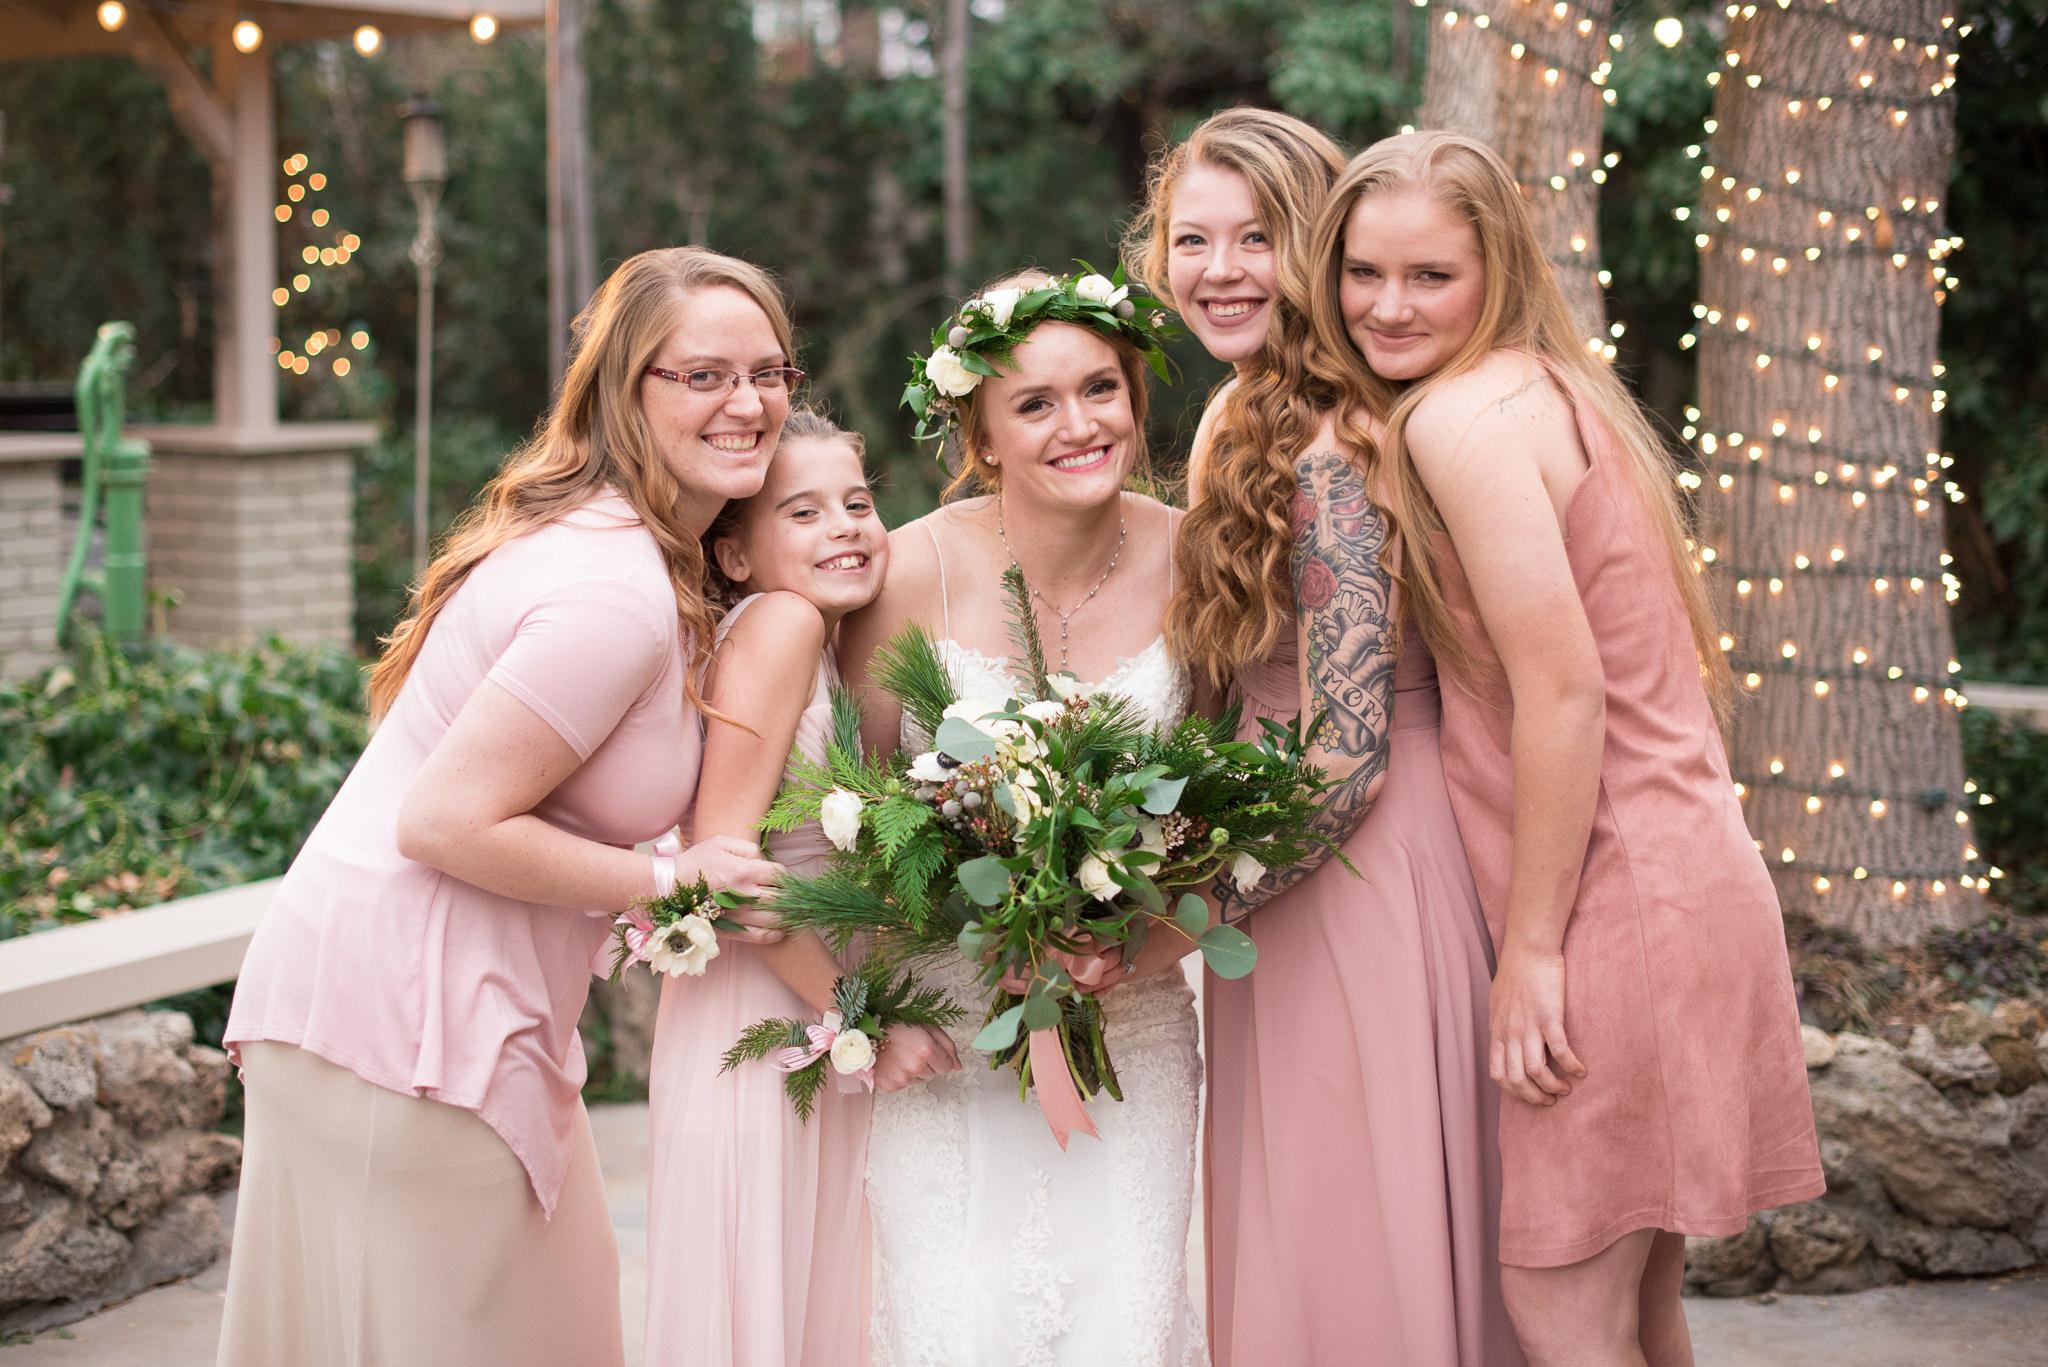 Trevor-Hooper-Wedding-Photographer-The-Bungalow-Wedding-Utah_CLR_045.jpg